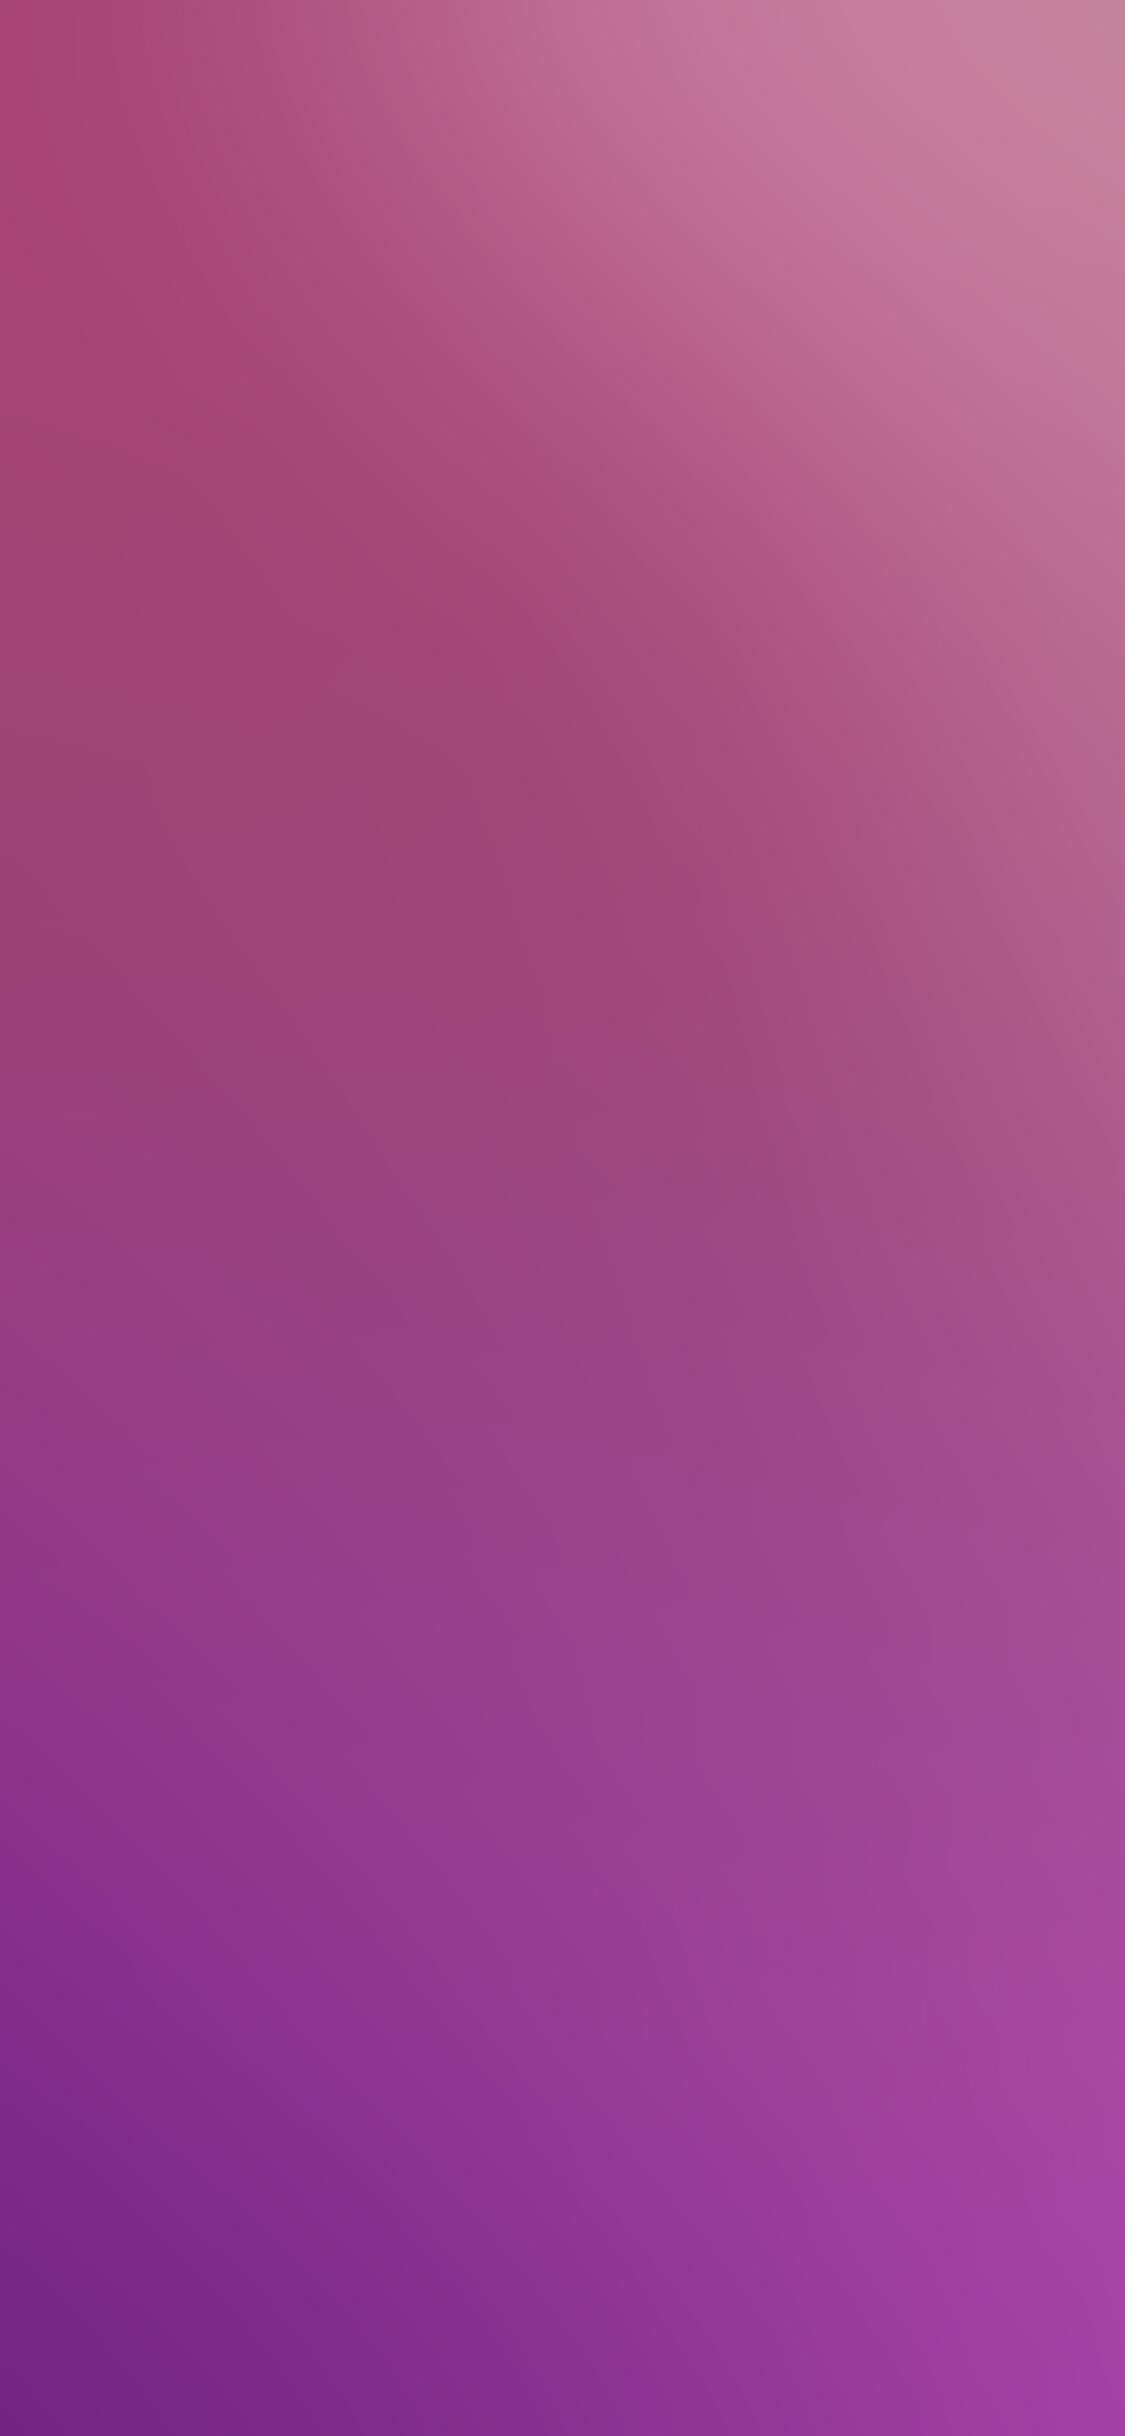 iPhoneXpapers.com-Apple-iPhone-wallpaper-sg41-purple-morning-calm-gradation-blur